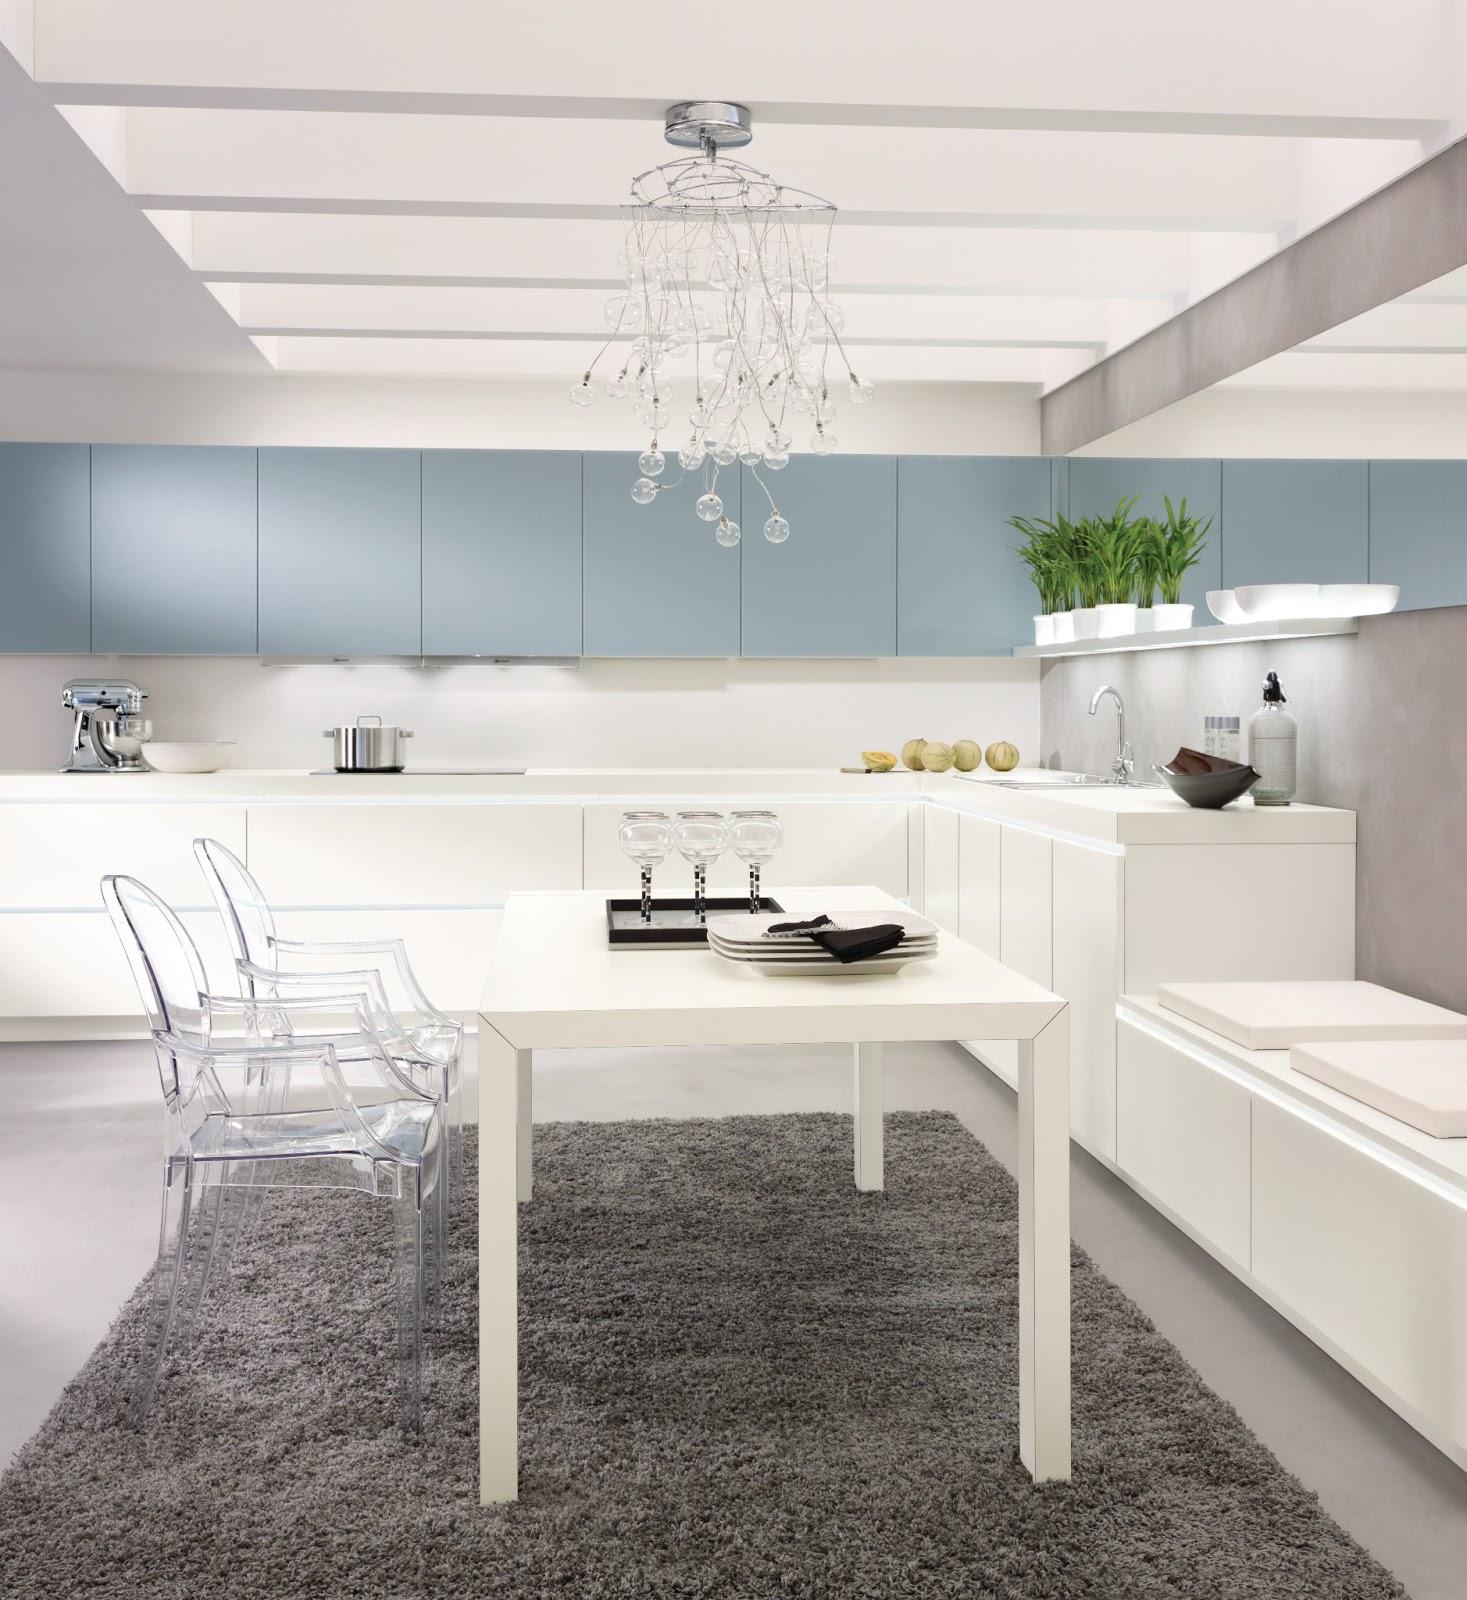 Cuisine design pur e for Cuisine epuree blanche